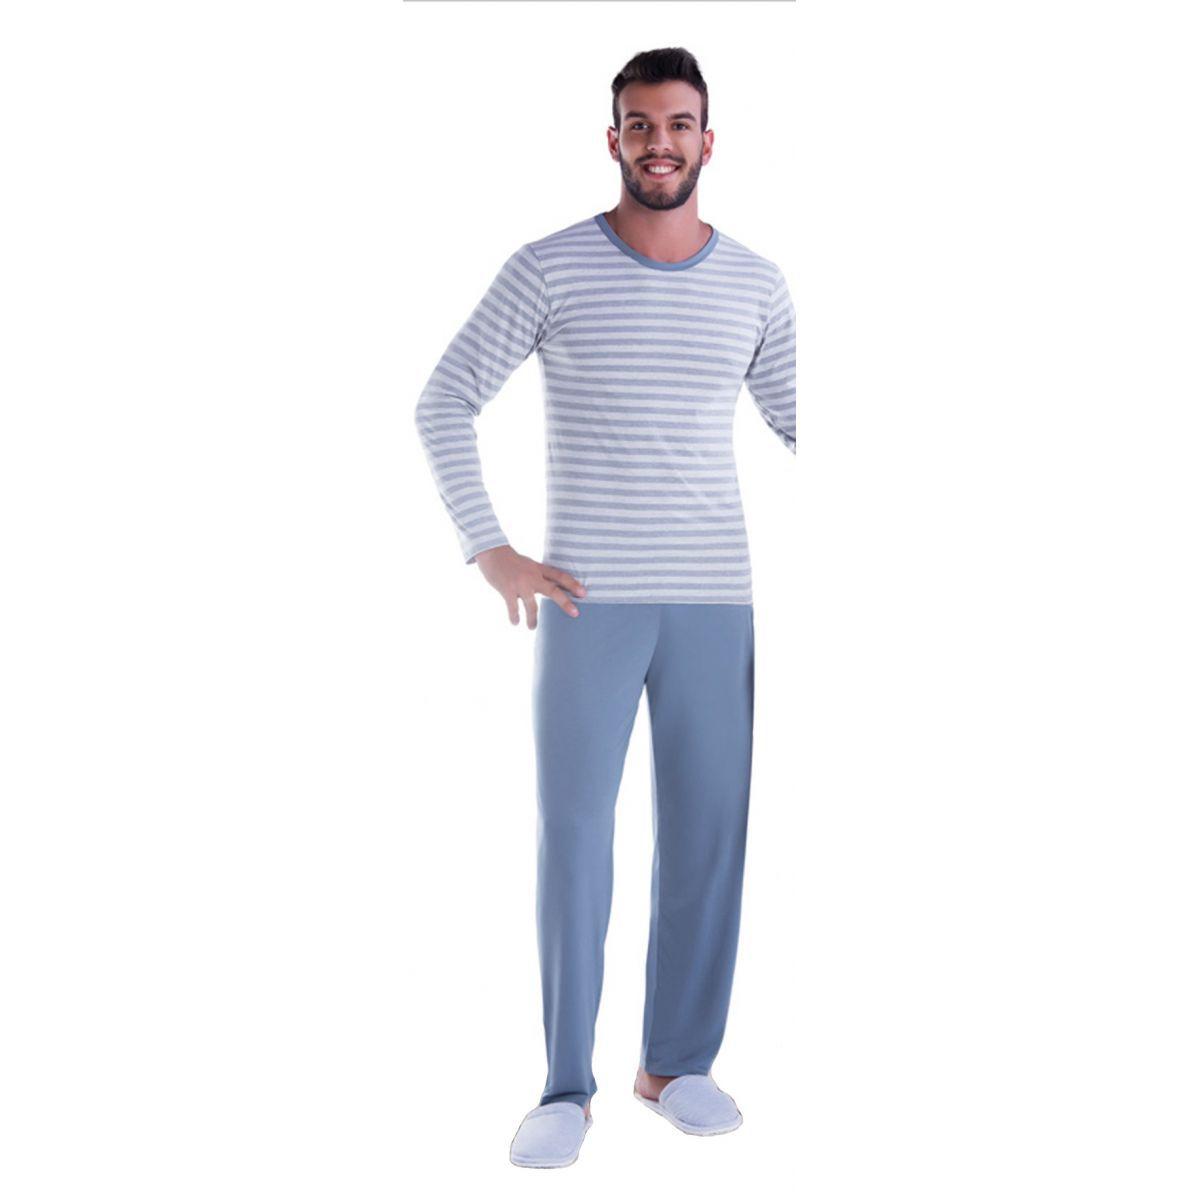 Pijama Masculino de Inverno Listrado - Victory 17135